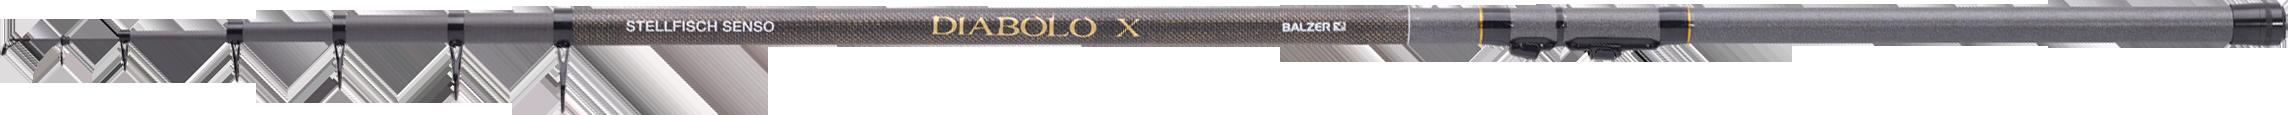 Diabolo X Stellfisch Senso